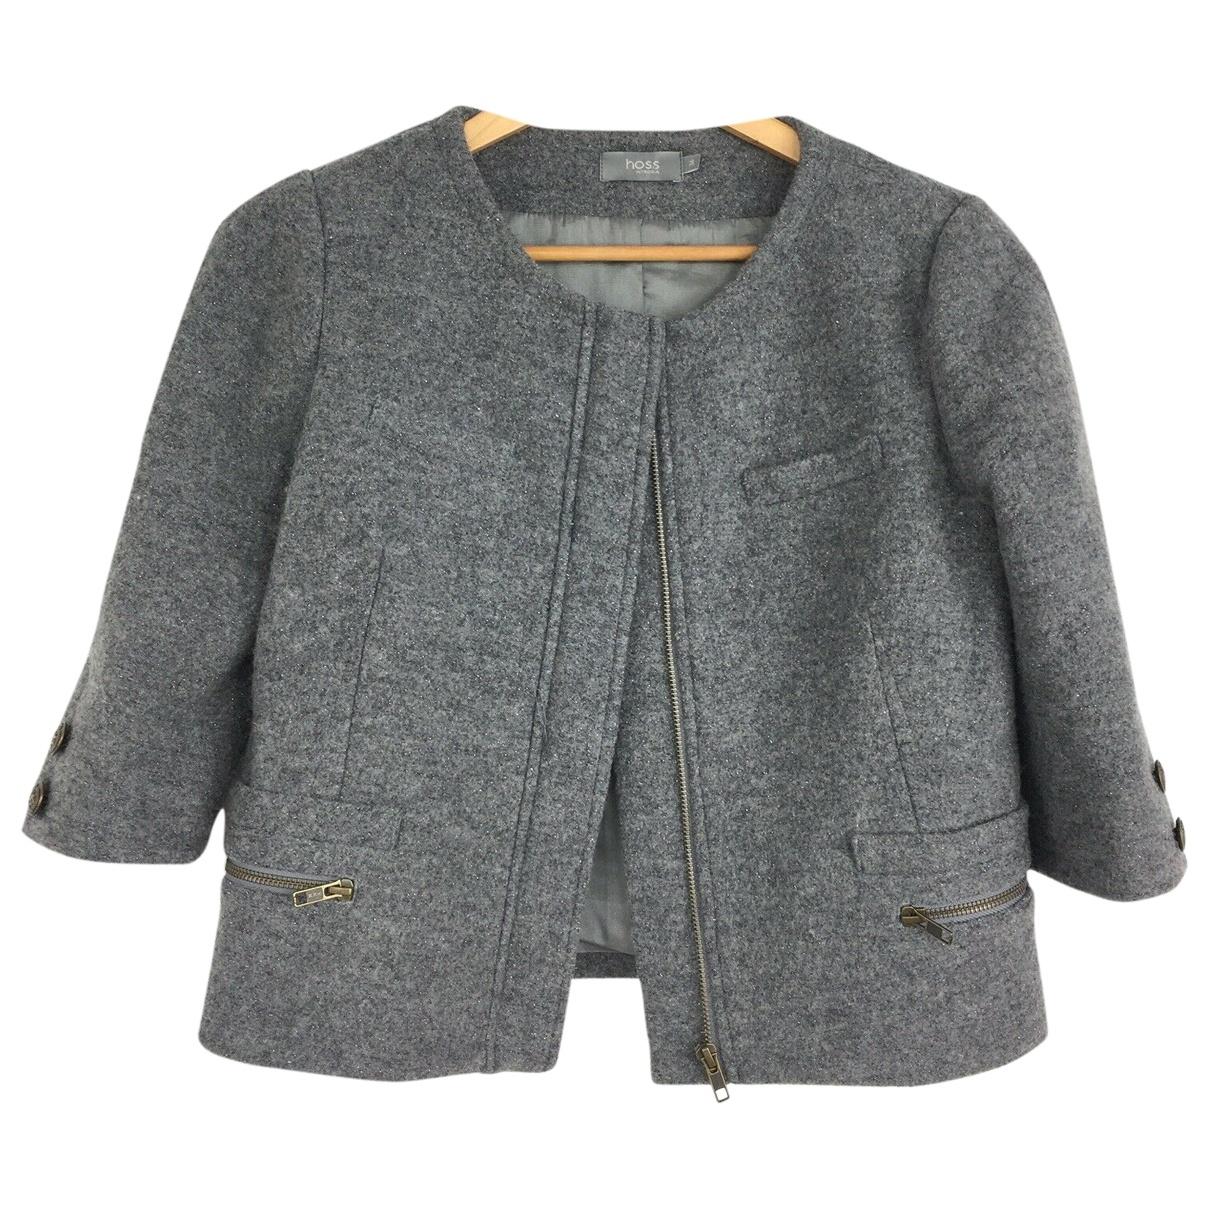 Hoss Intropia \N Jacke in  Grau Wolle